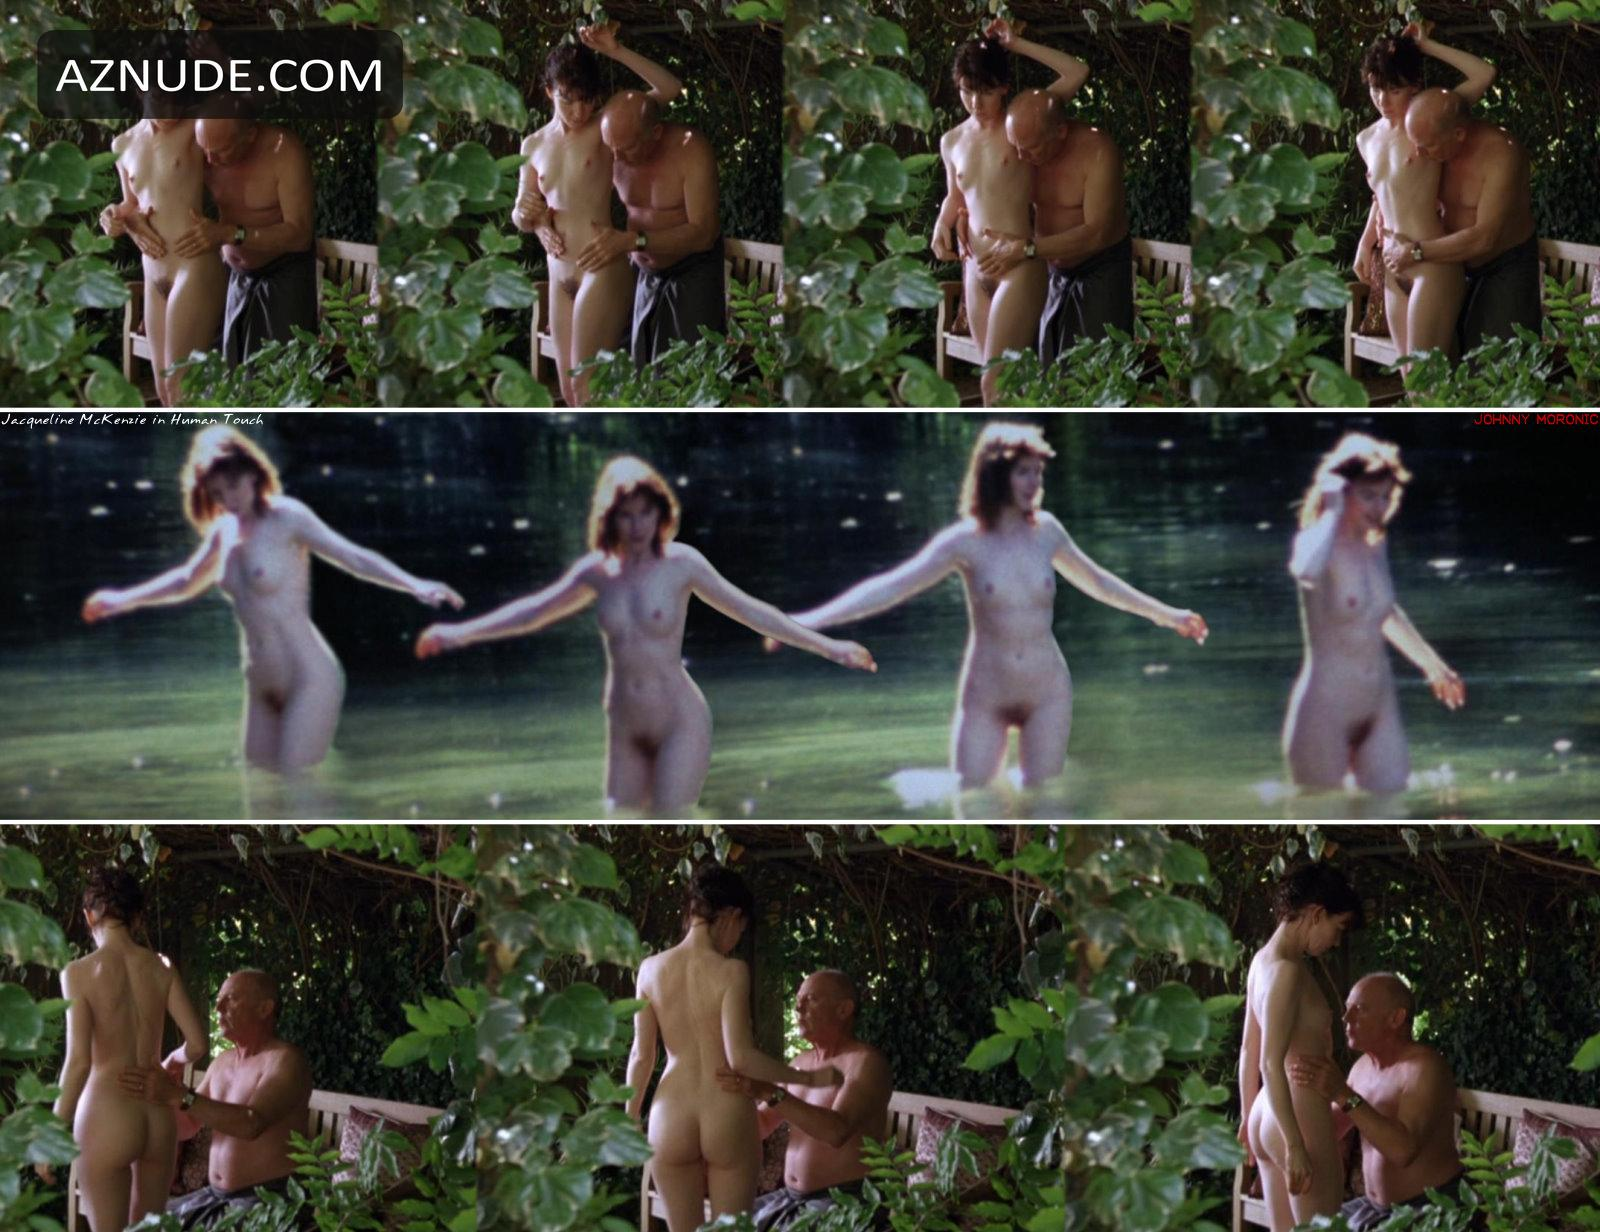 jacqueline mckenzie nude